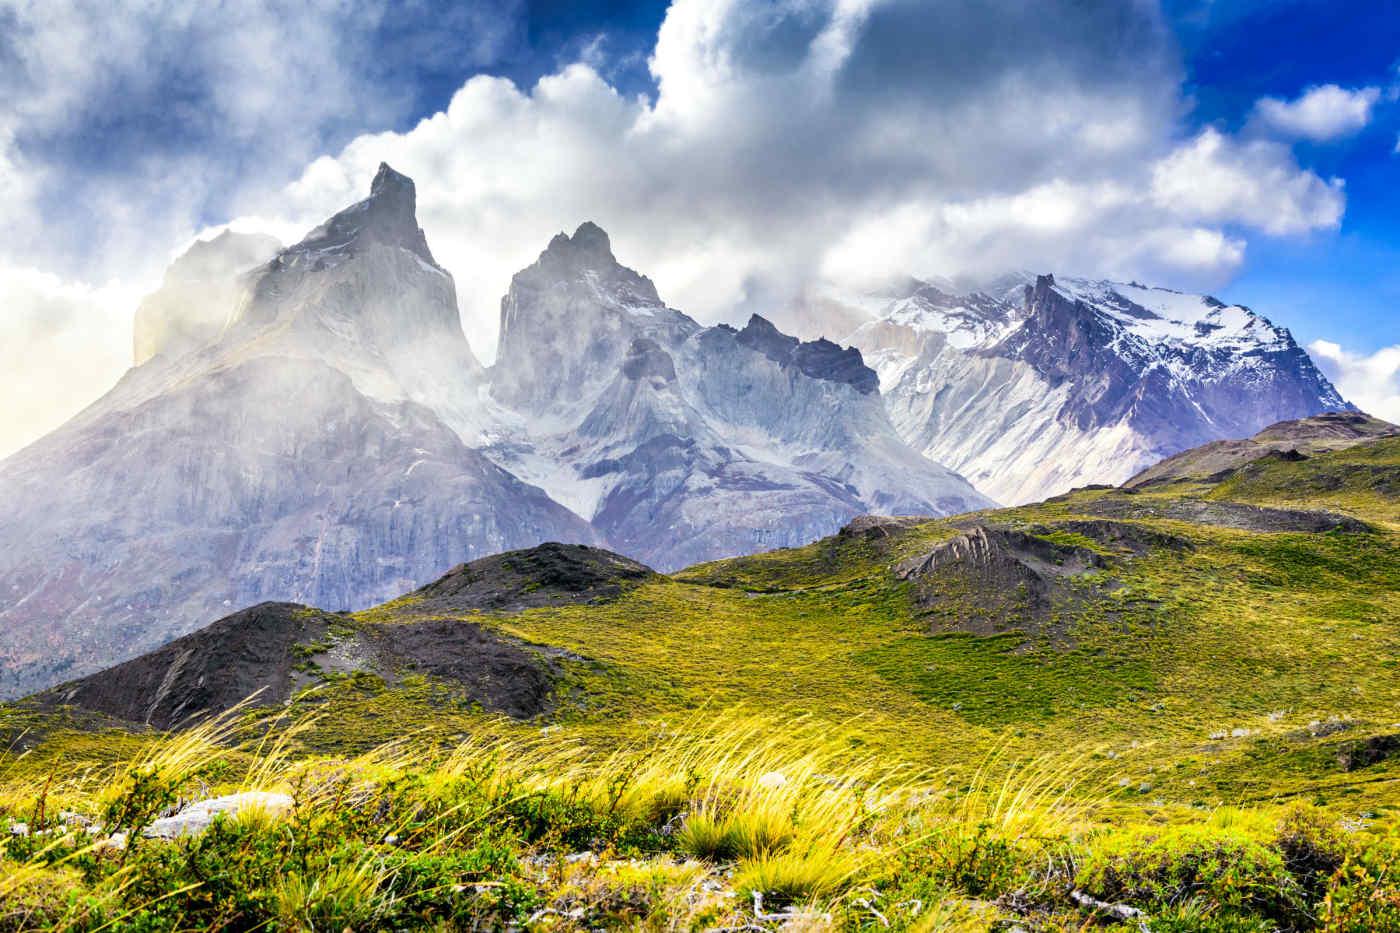 Torres del Paine National Park • Chile